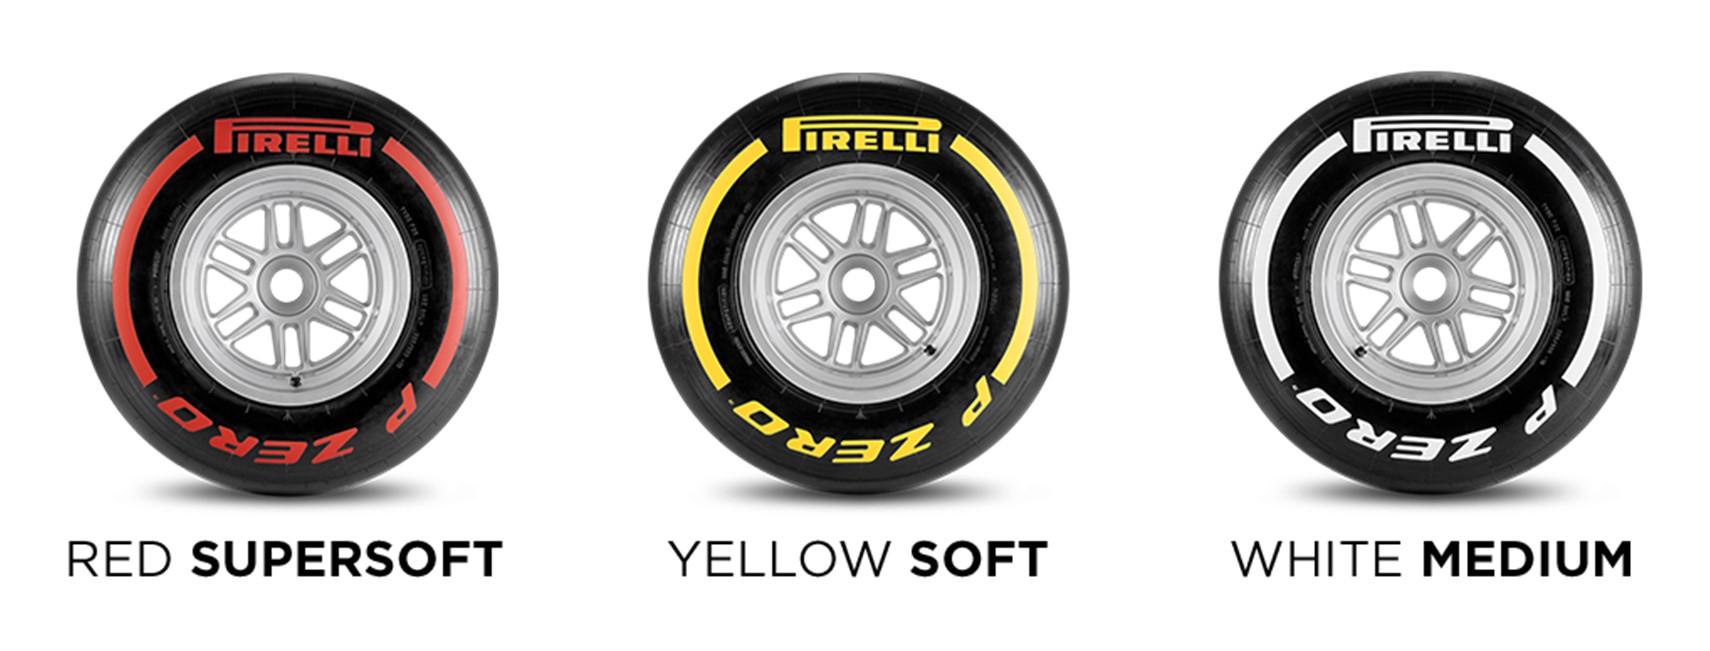 pirelli1_3.jpg